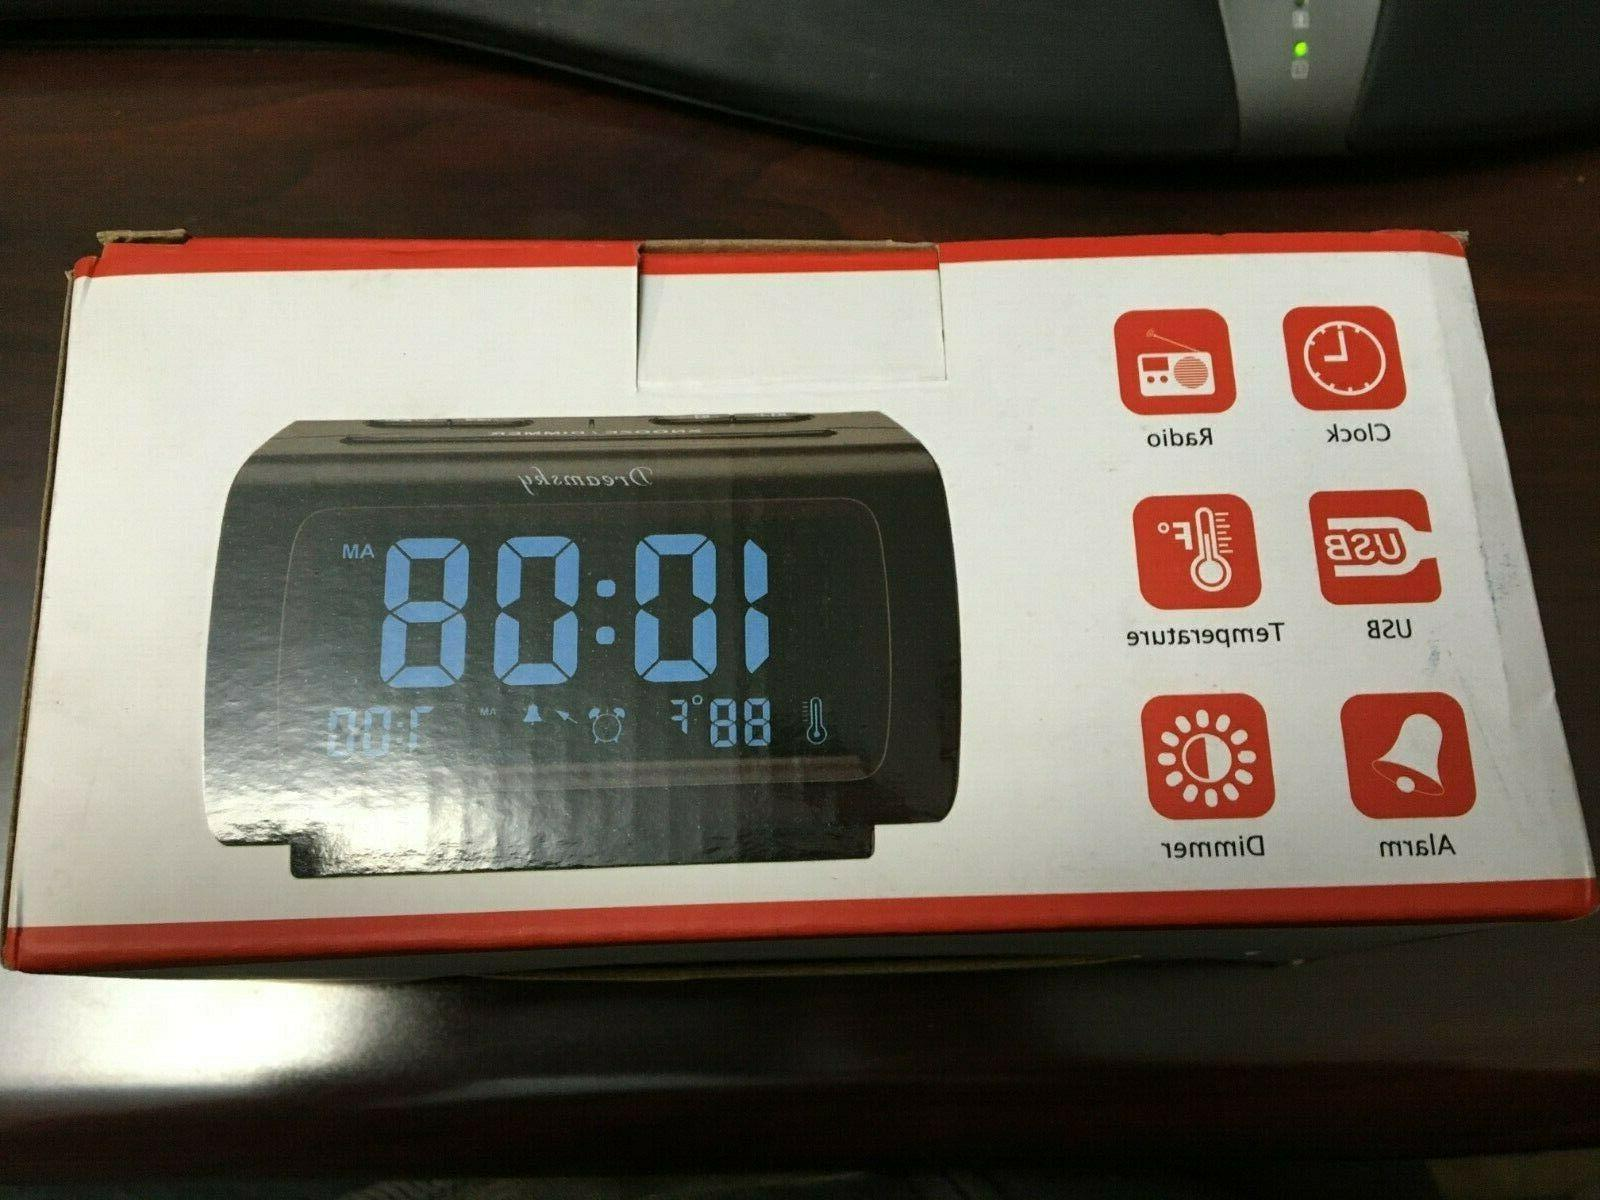 ds206 alarm clock with usb port fm